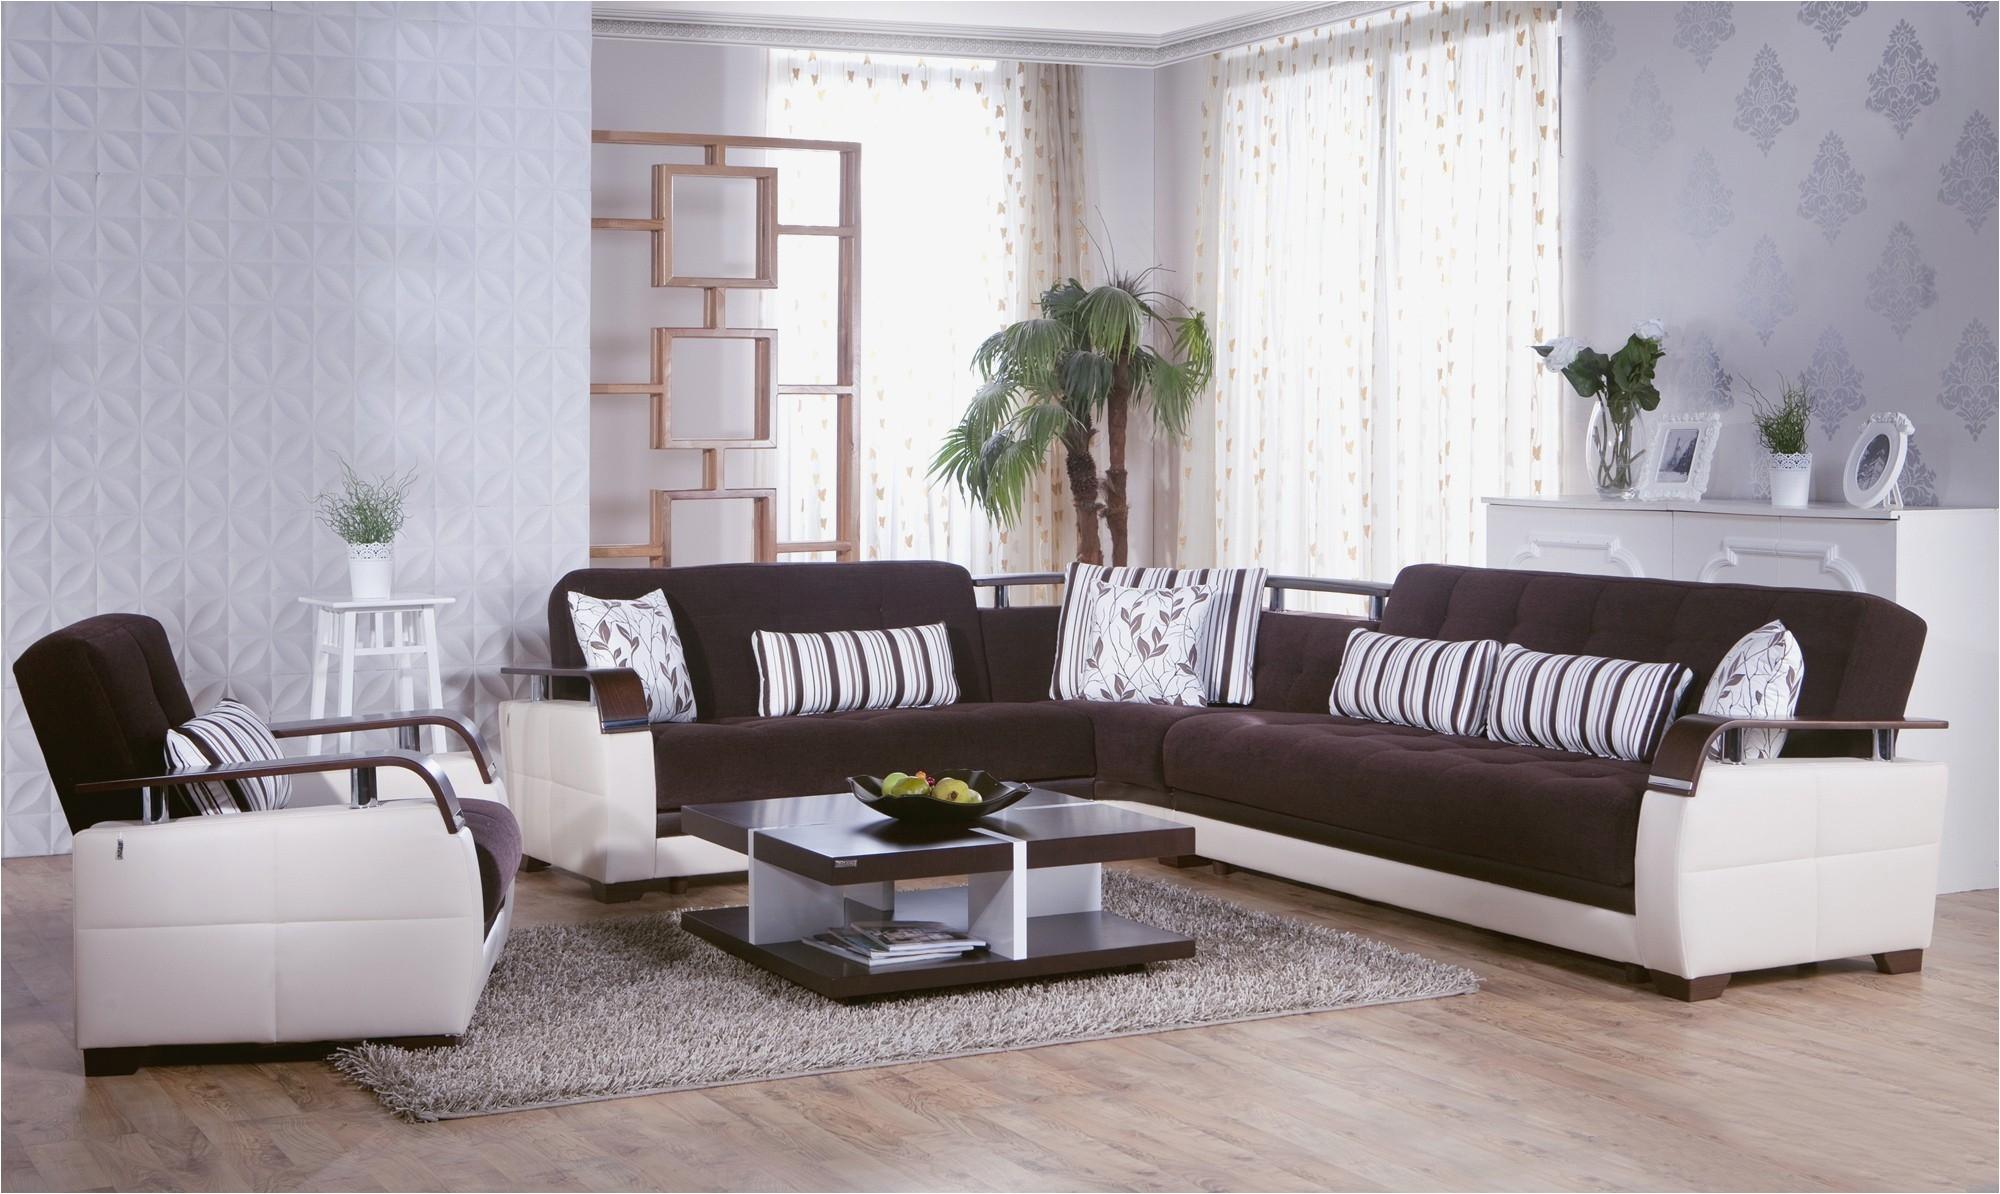 modern furniture design furniture badcock furniture badcock furniture 0d furnitures design